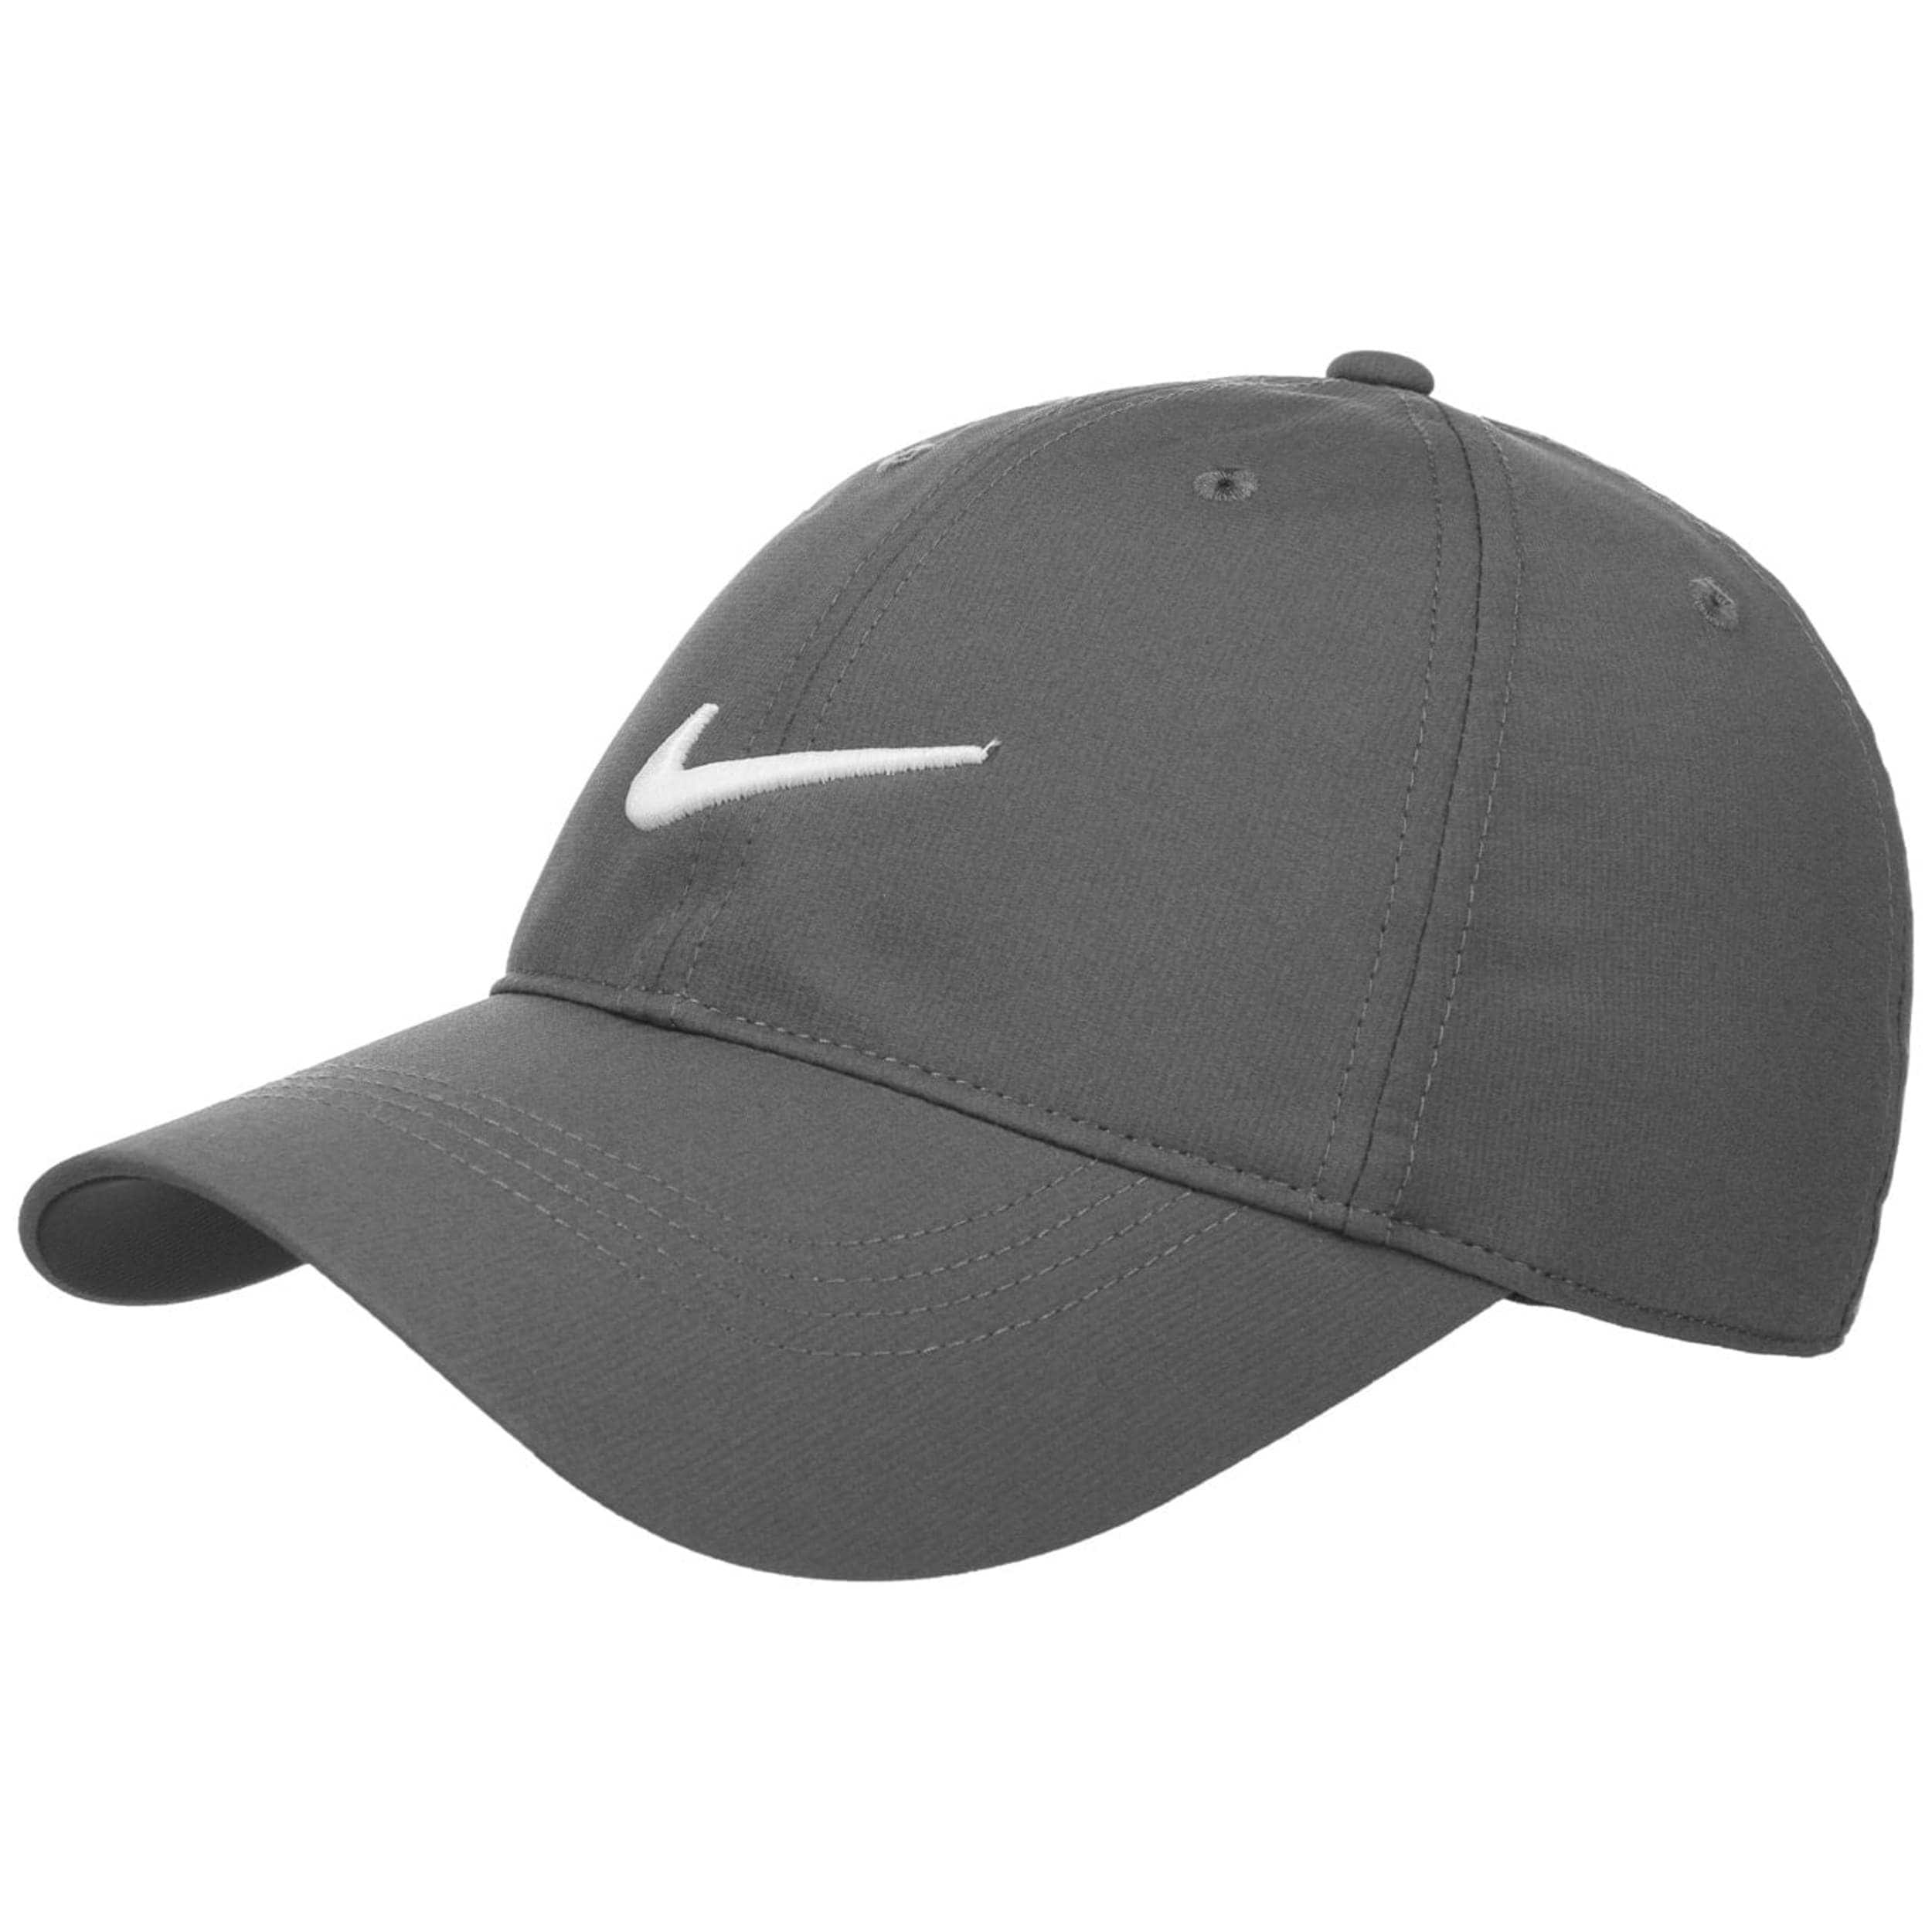 d73ec495dfac7 Gorra Legacy91 Tech Cap by Nike Gorras sombreroshop es.45329a